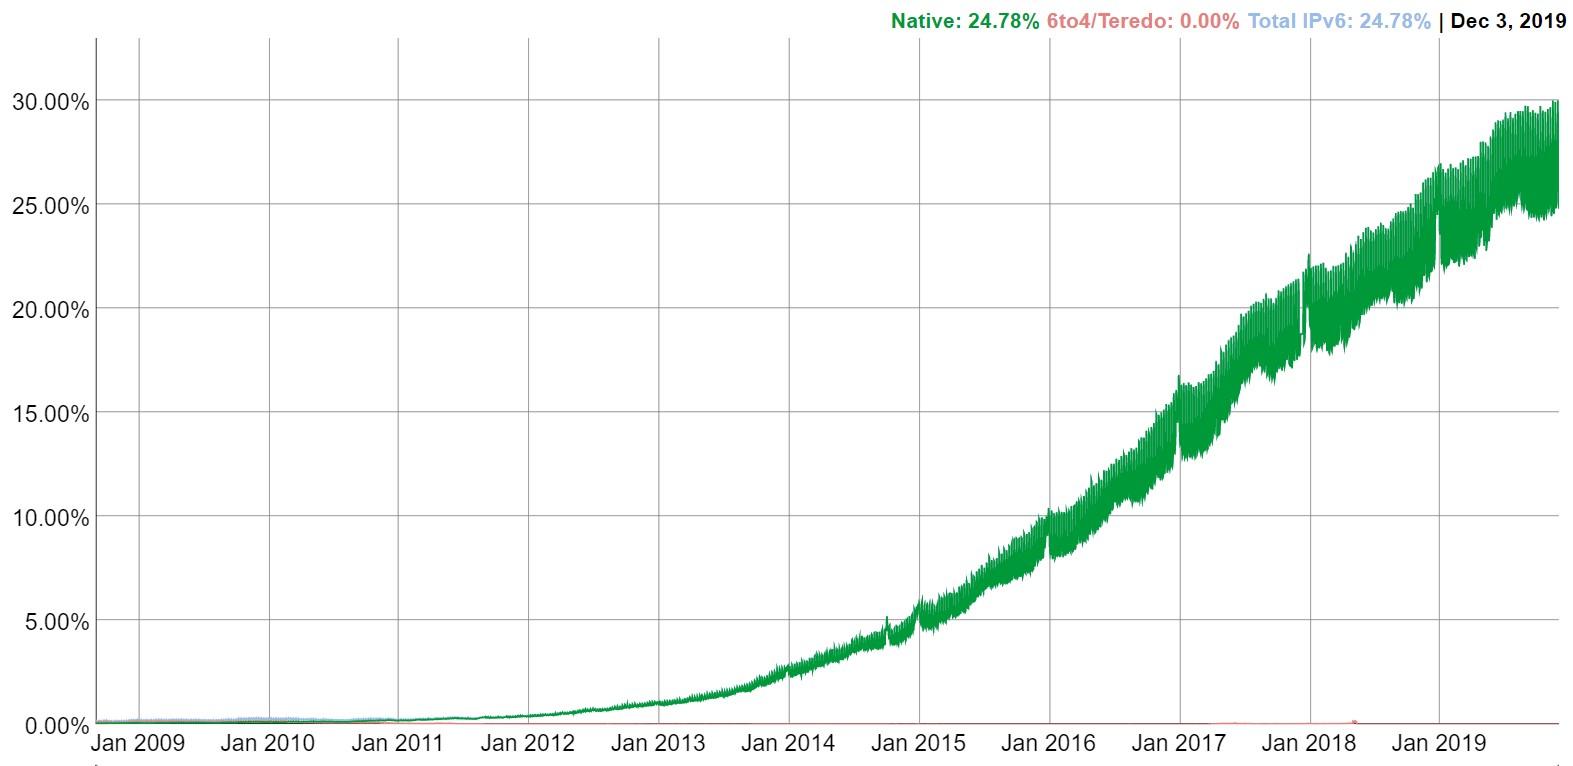 IPv6 growth, 2019